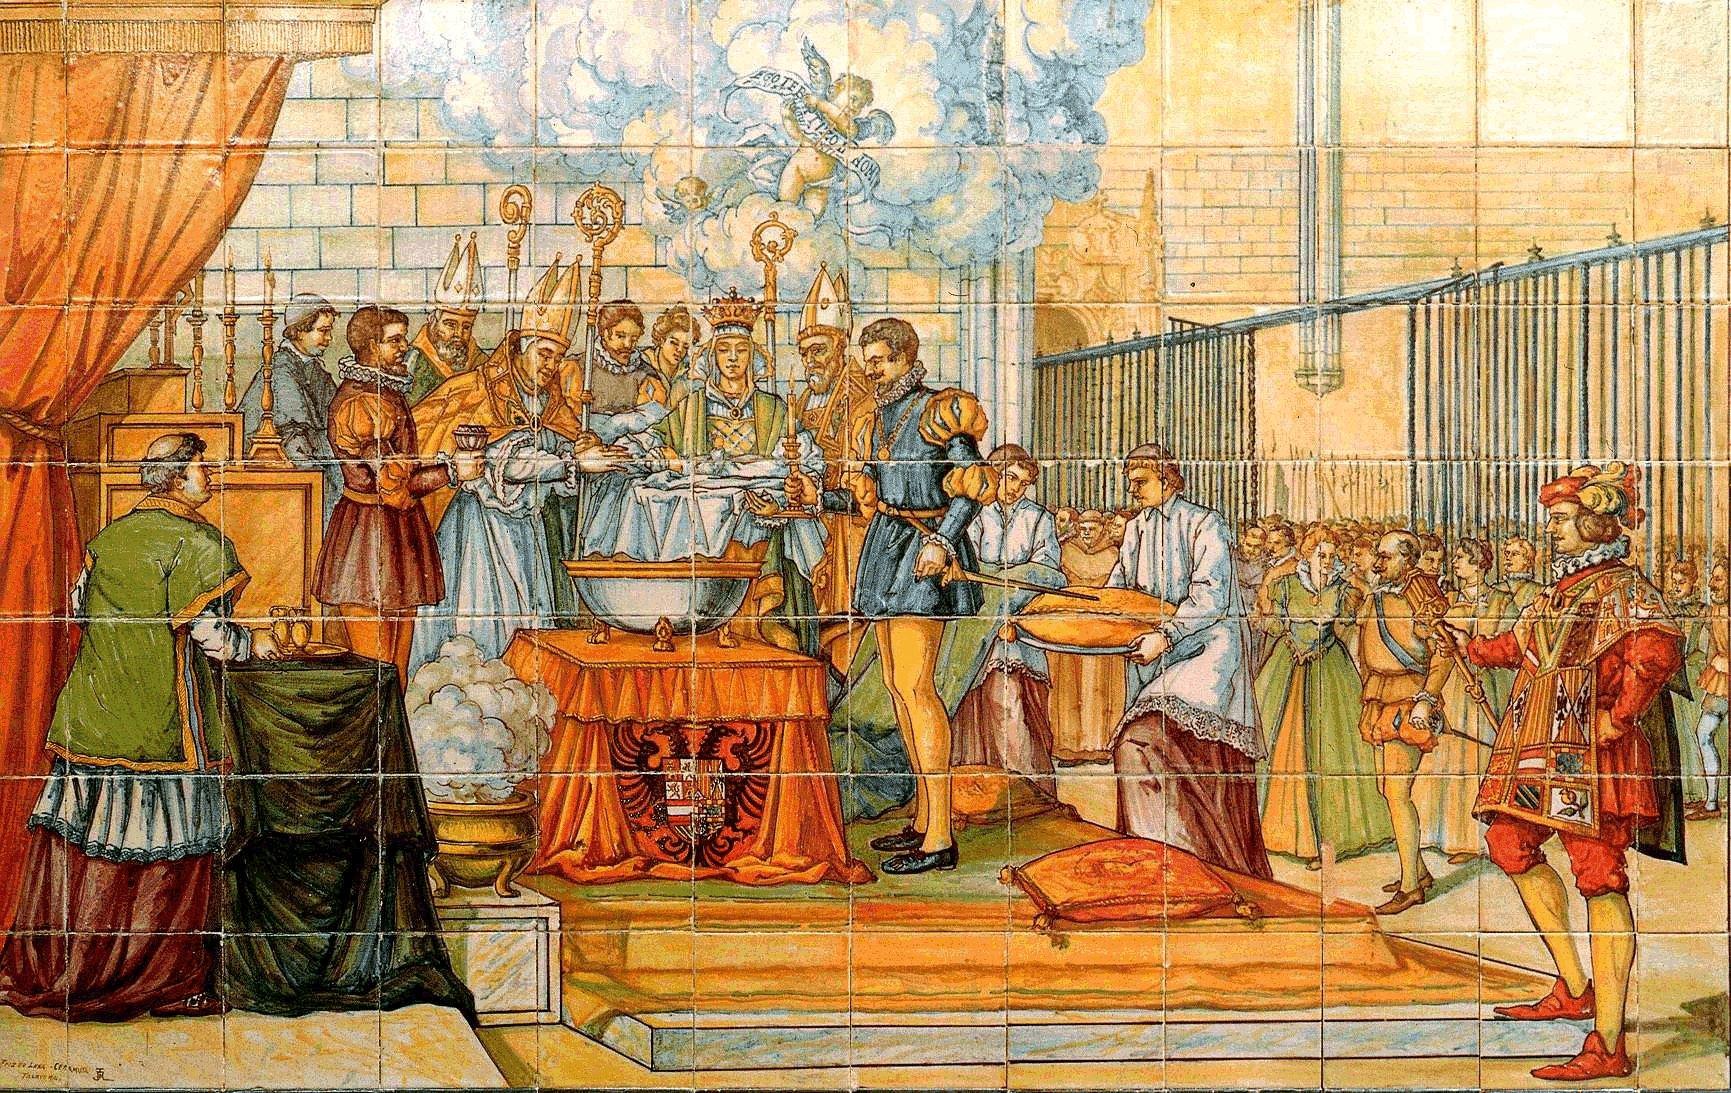 """The Baptism of Phillip II""in Valladolid, Spain. Historical ceiling preserved in Palacio de Pimentel. (Public Domain)"